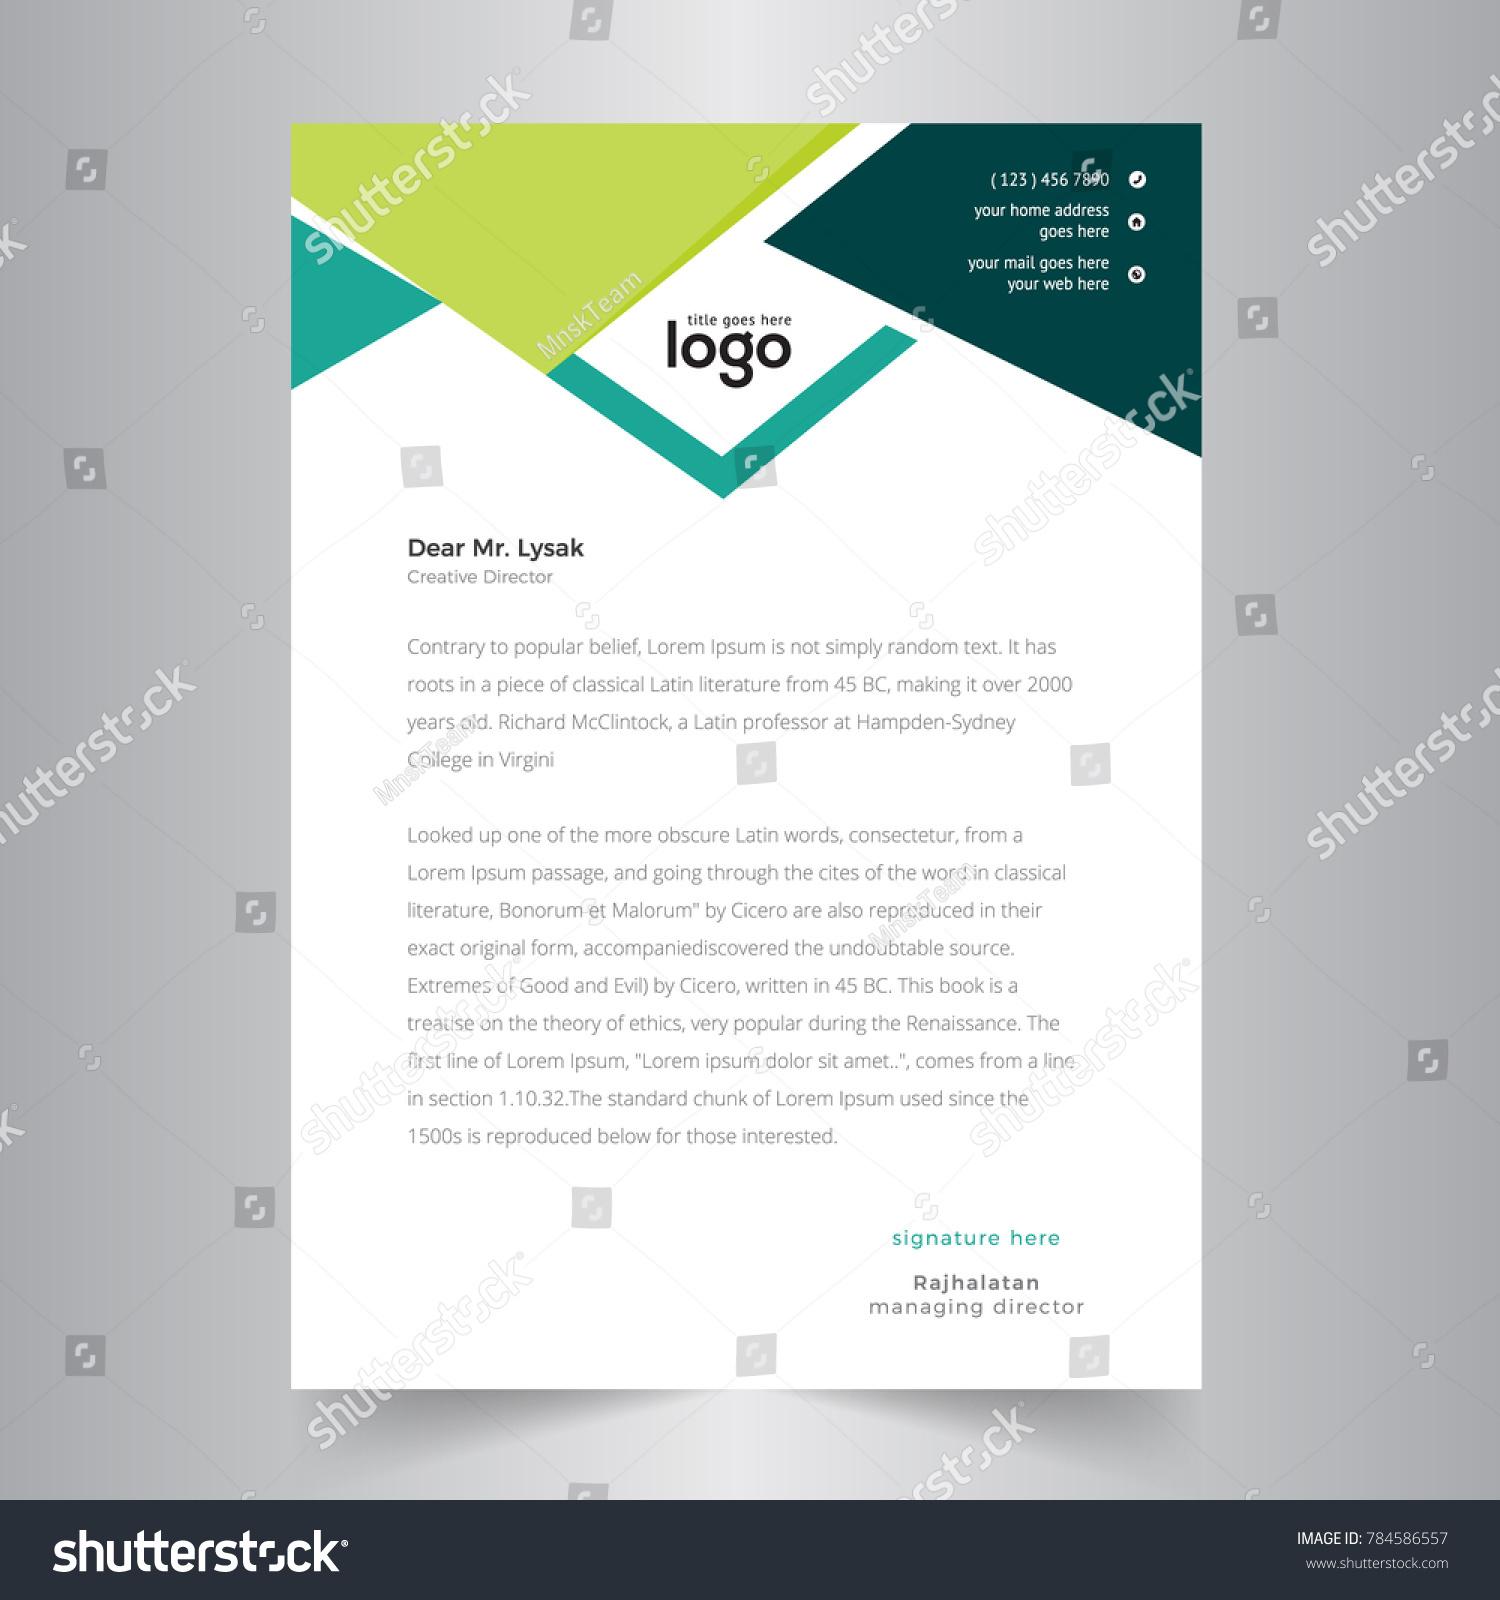 Creative business letterhead design stock vector hd royalty free creative business letterhead design spiritdancerdesigns Gallery